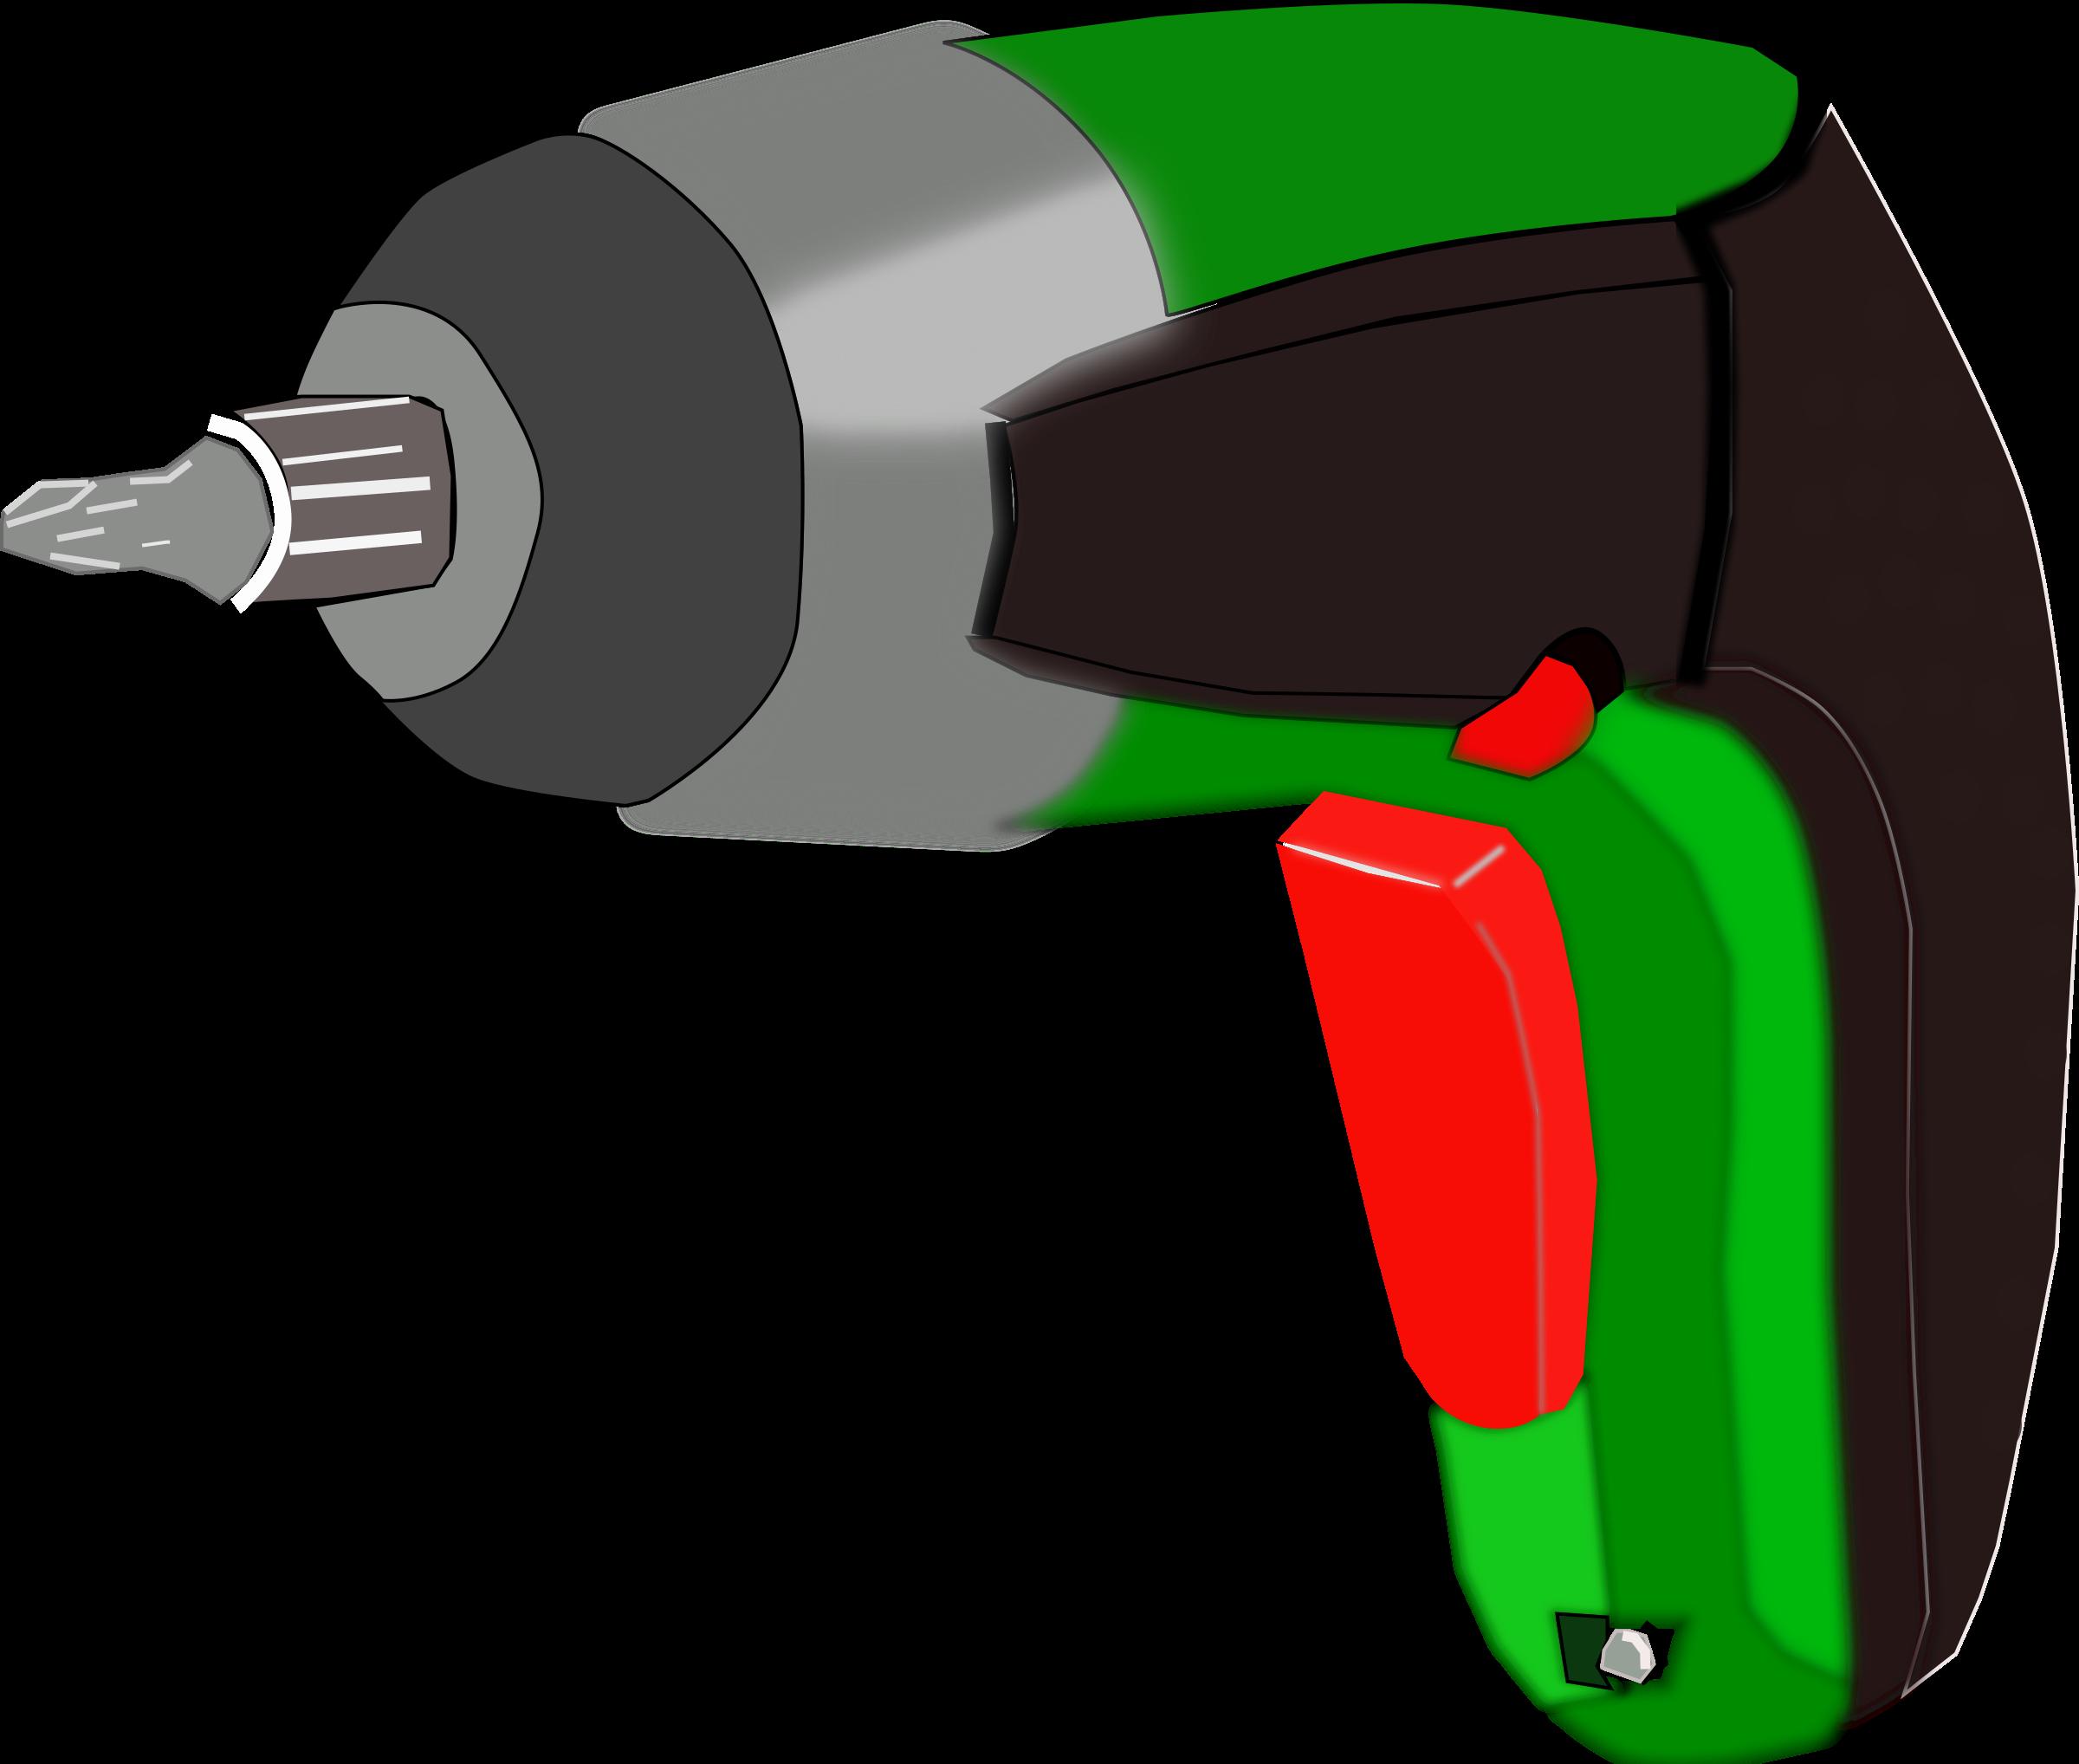 screwdriver clipart electric